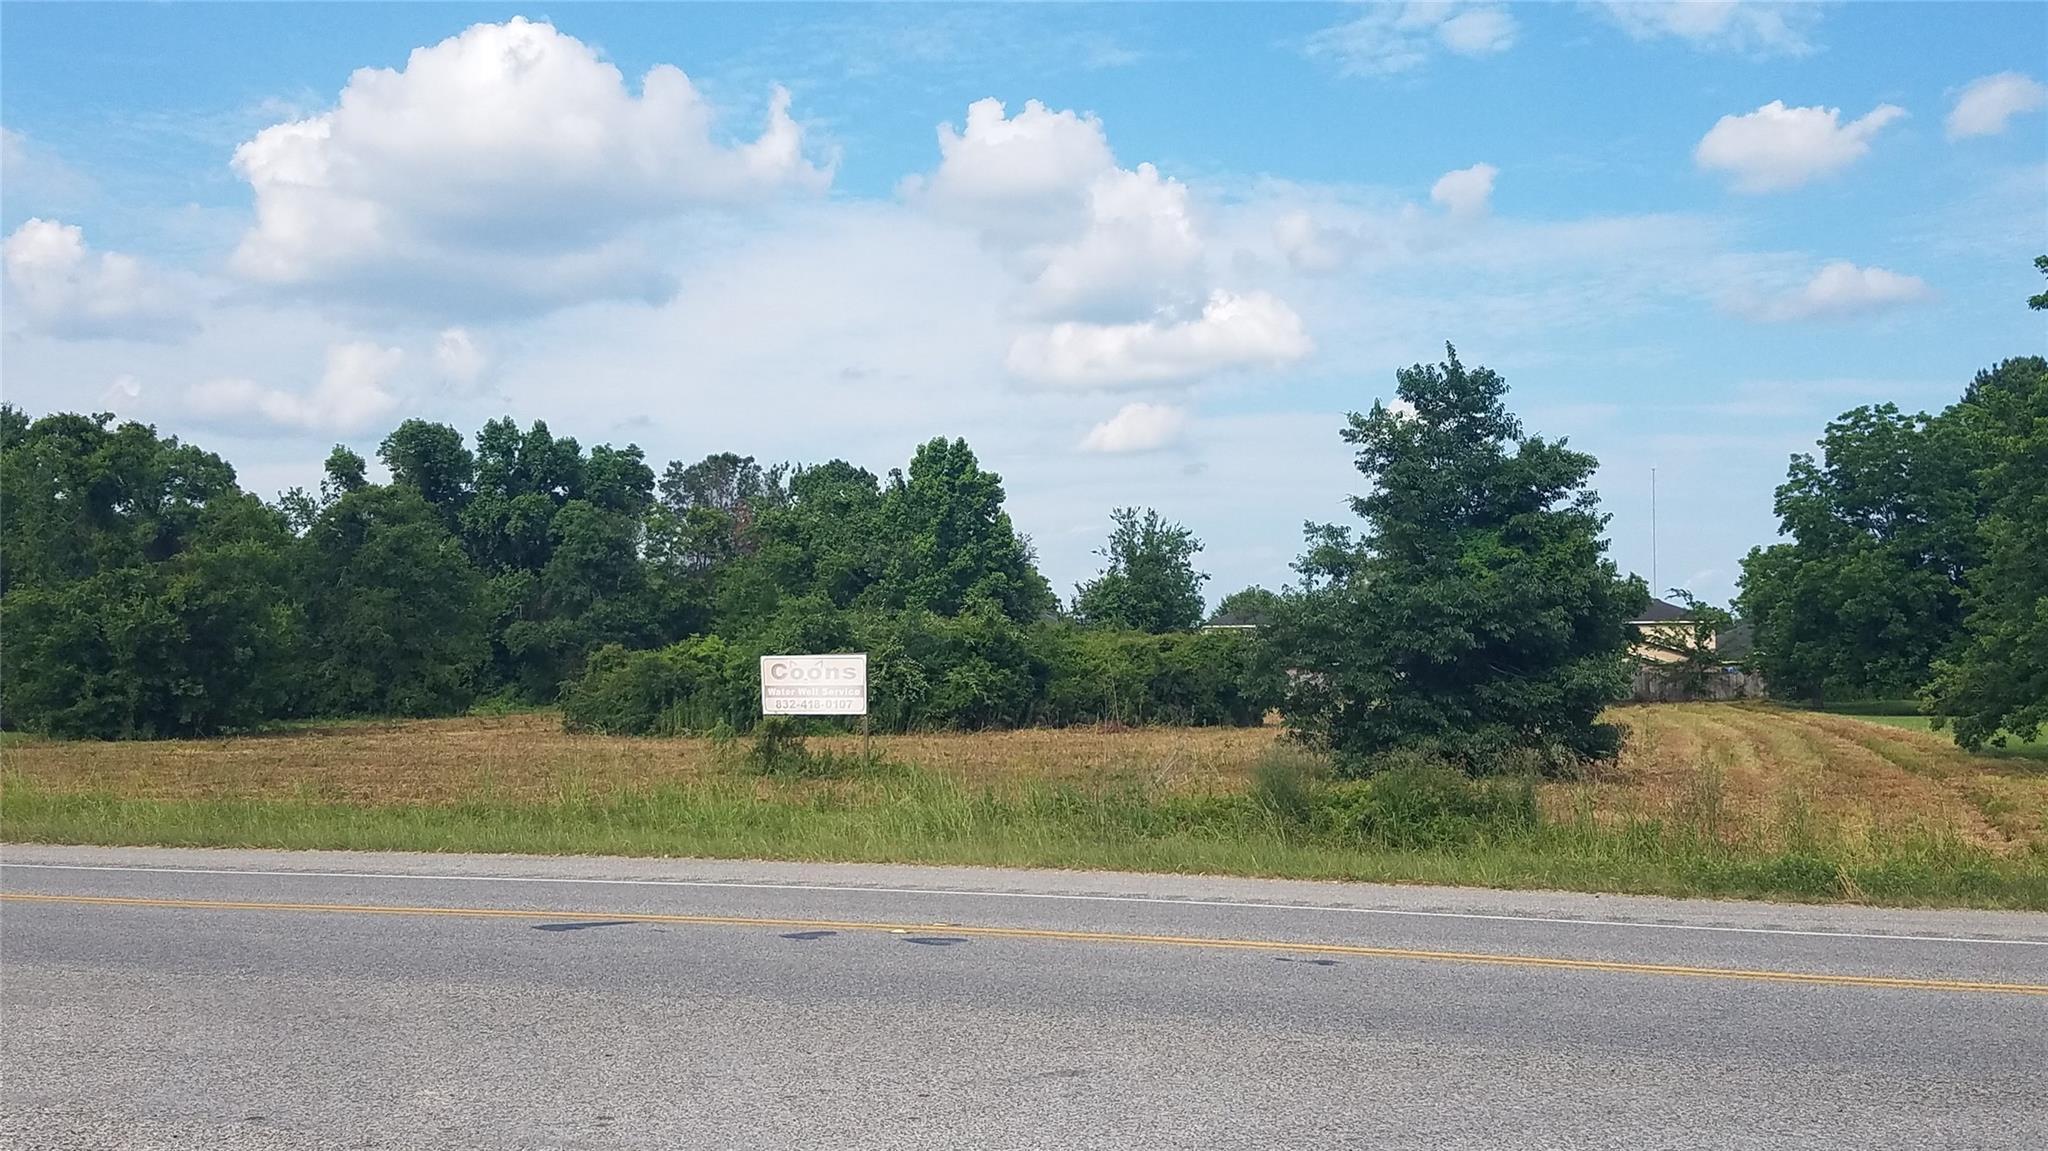 00 Fm 2100 Road Property Photo